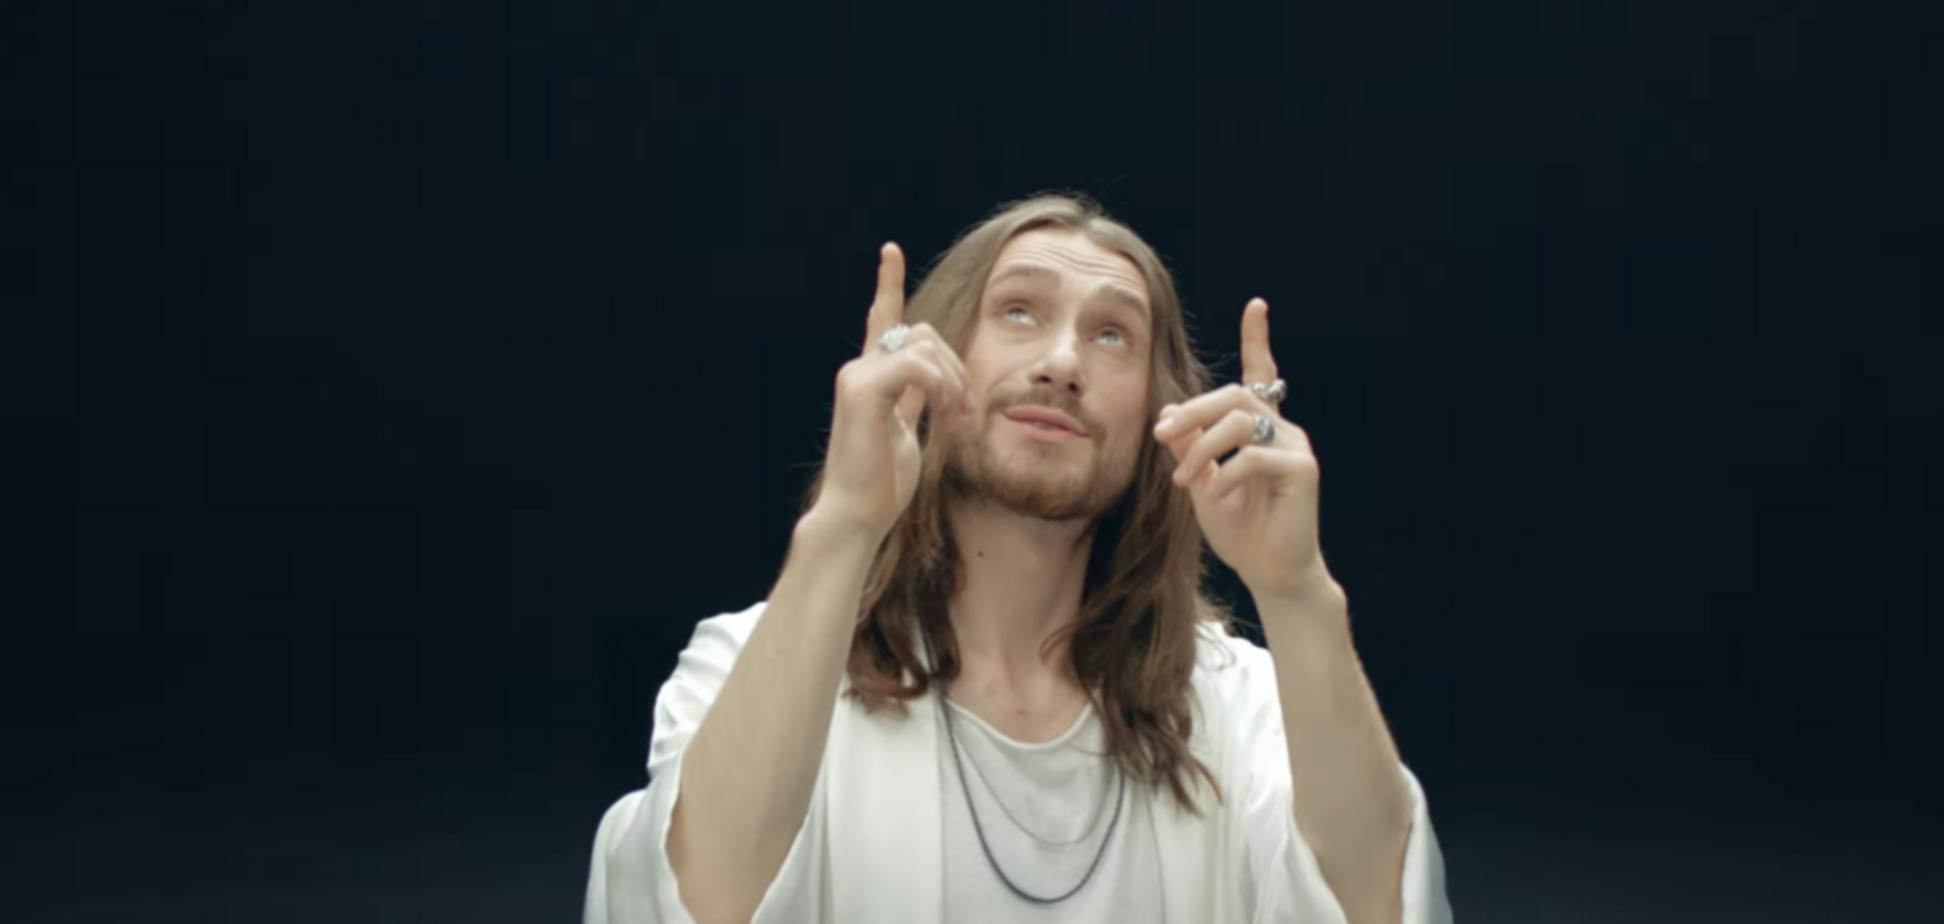 Кадр з кліпу на пісню i_ $ uss